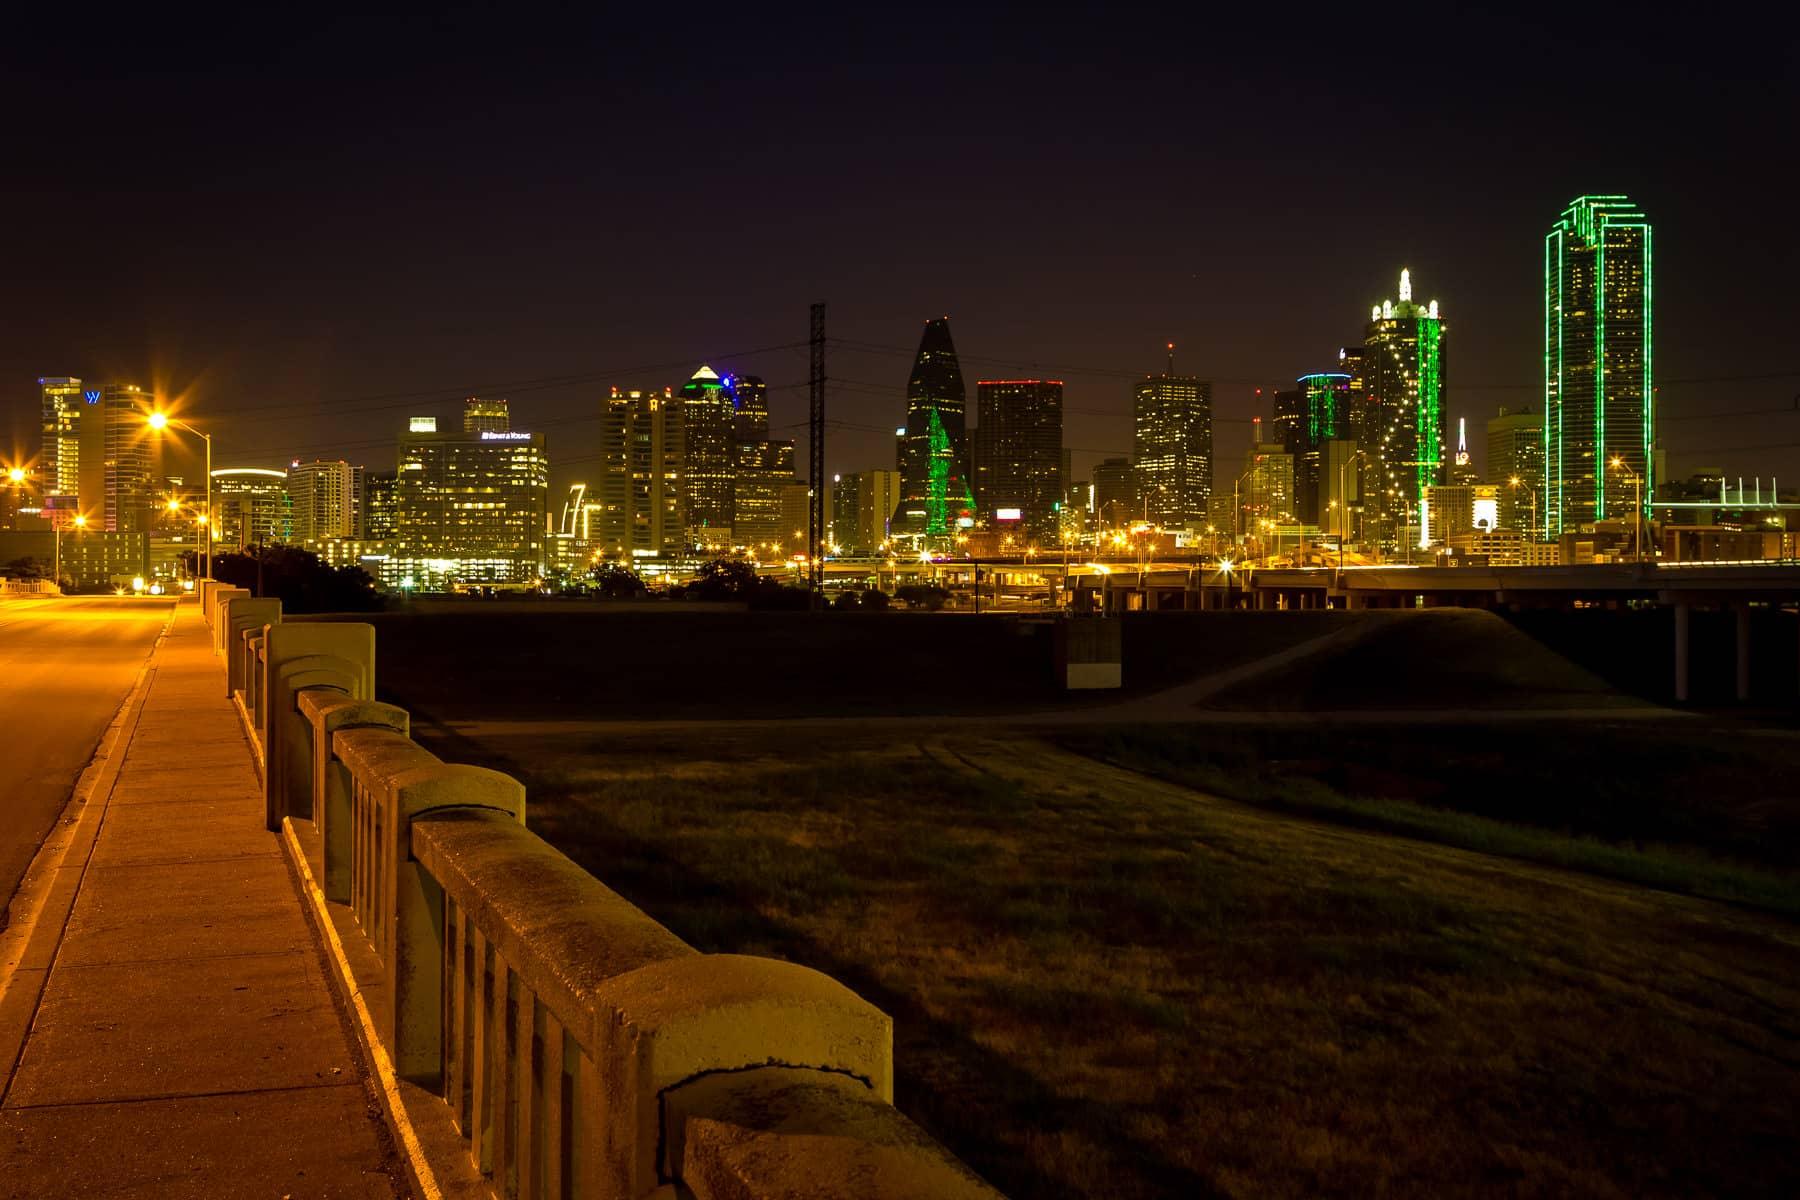 Dallas' distinctive skyline as seen from the Continental Avenue Bridge over the Trinity River floodplain.